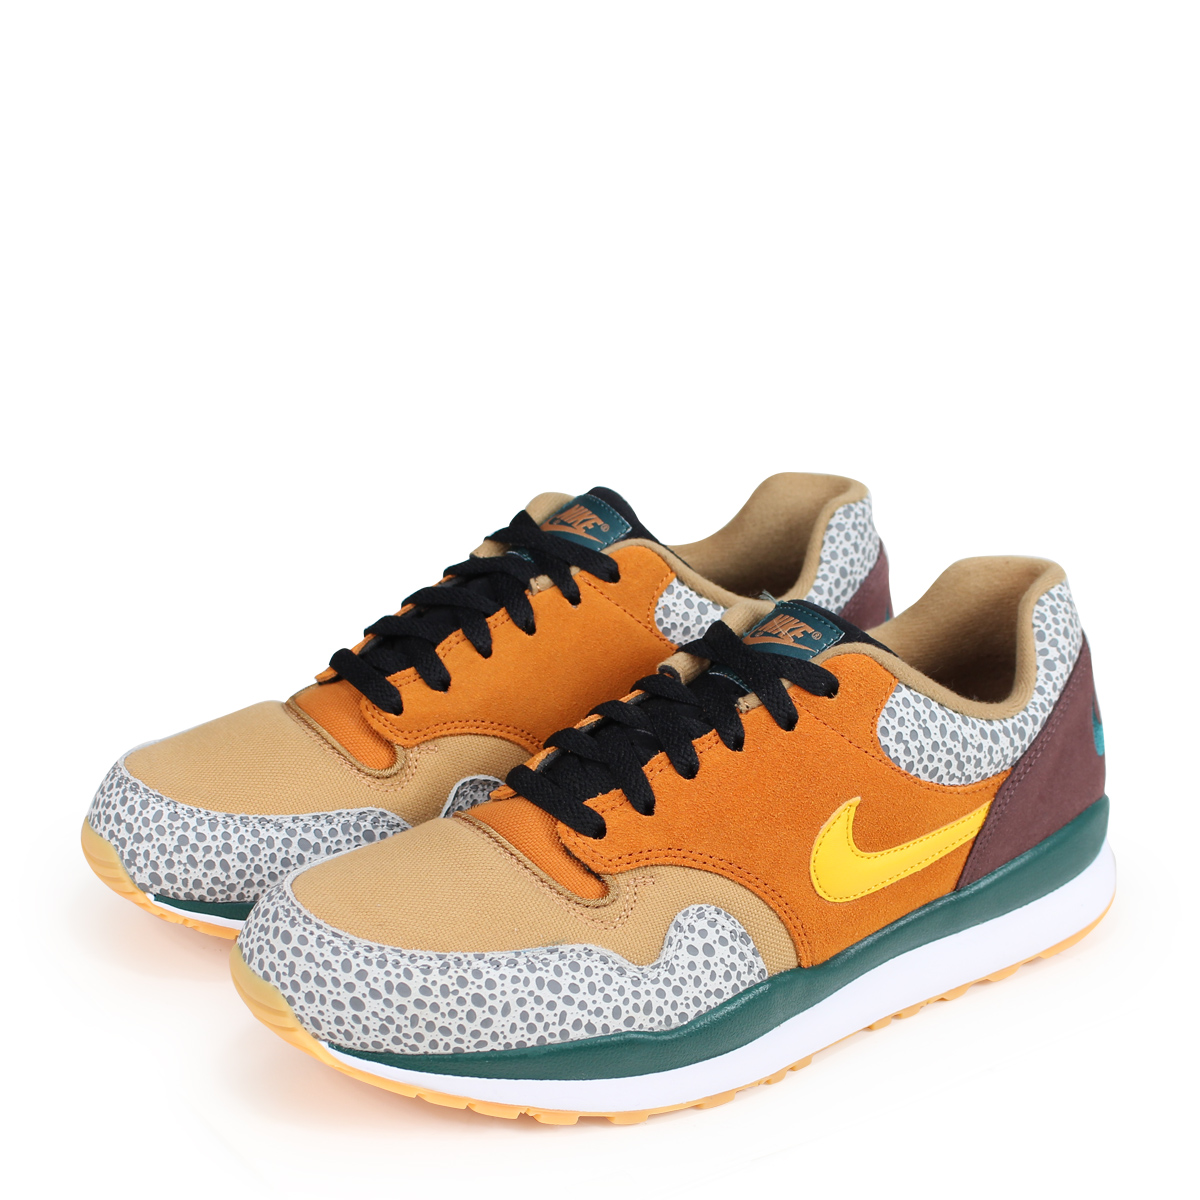 dcff30834bb86a ALLSPORTS  NIKE AIR SAFARI SE Nike air safari sneakers men AO3298 ...